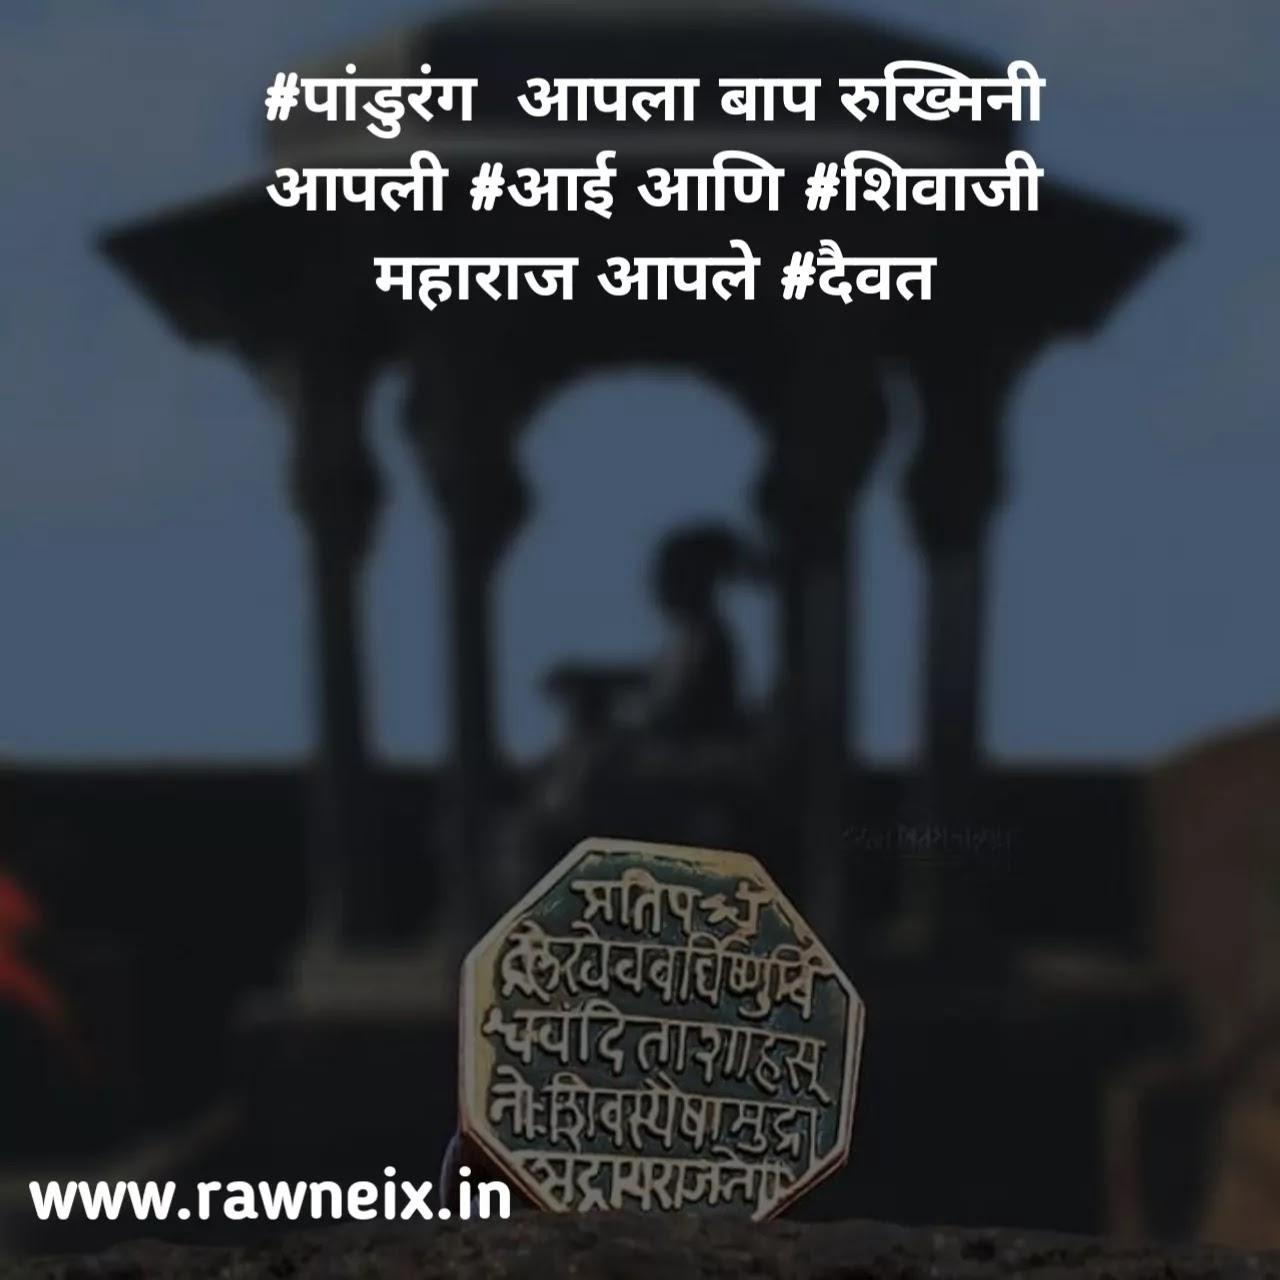 Shiv jayanti wishes images